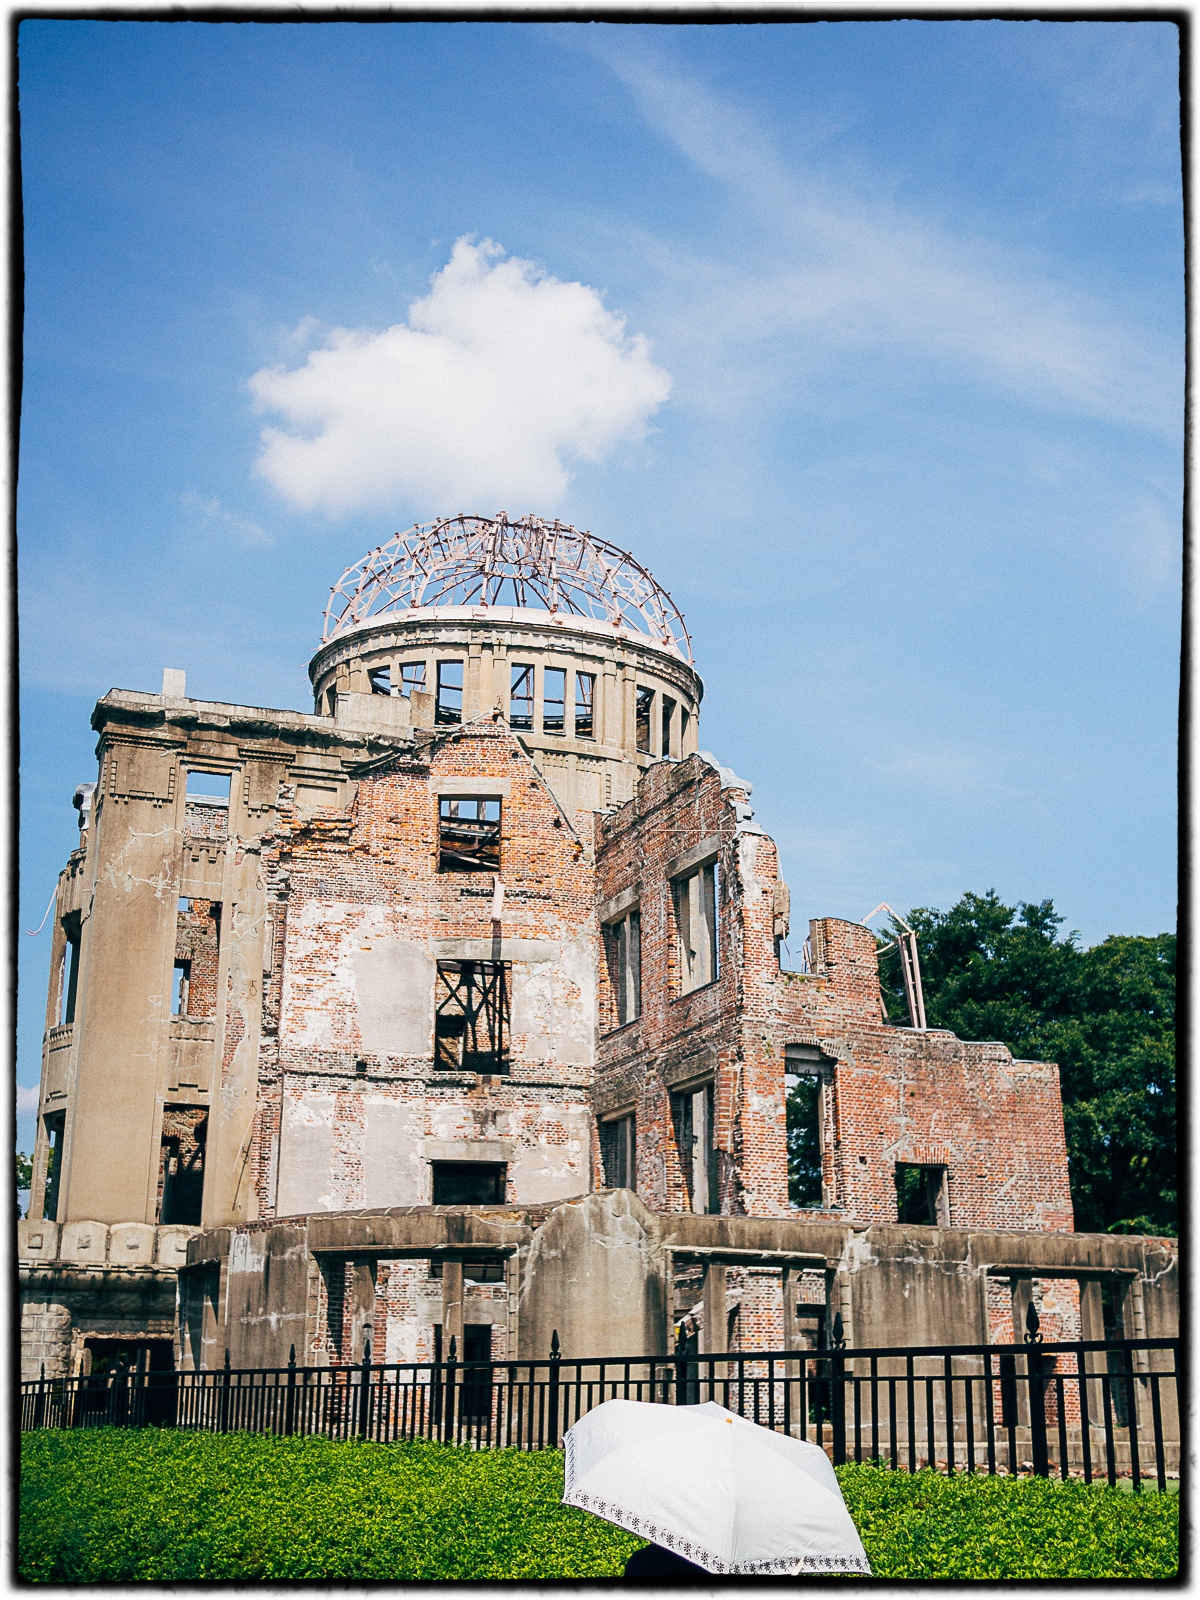 Cúpula de la Bomba Atómica - Hiroshima